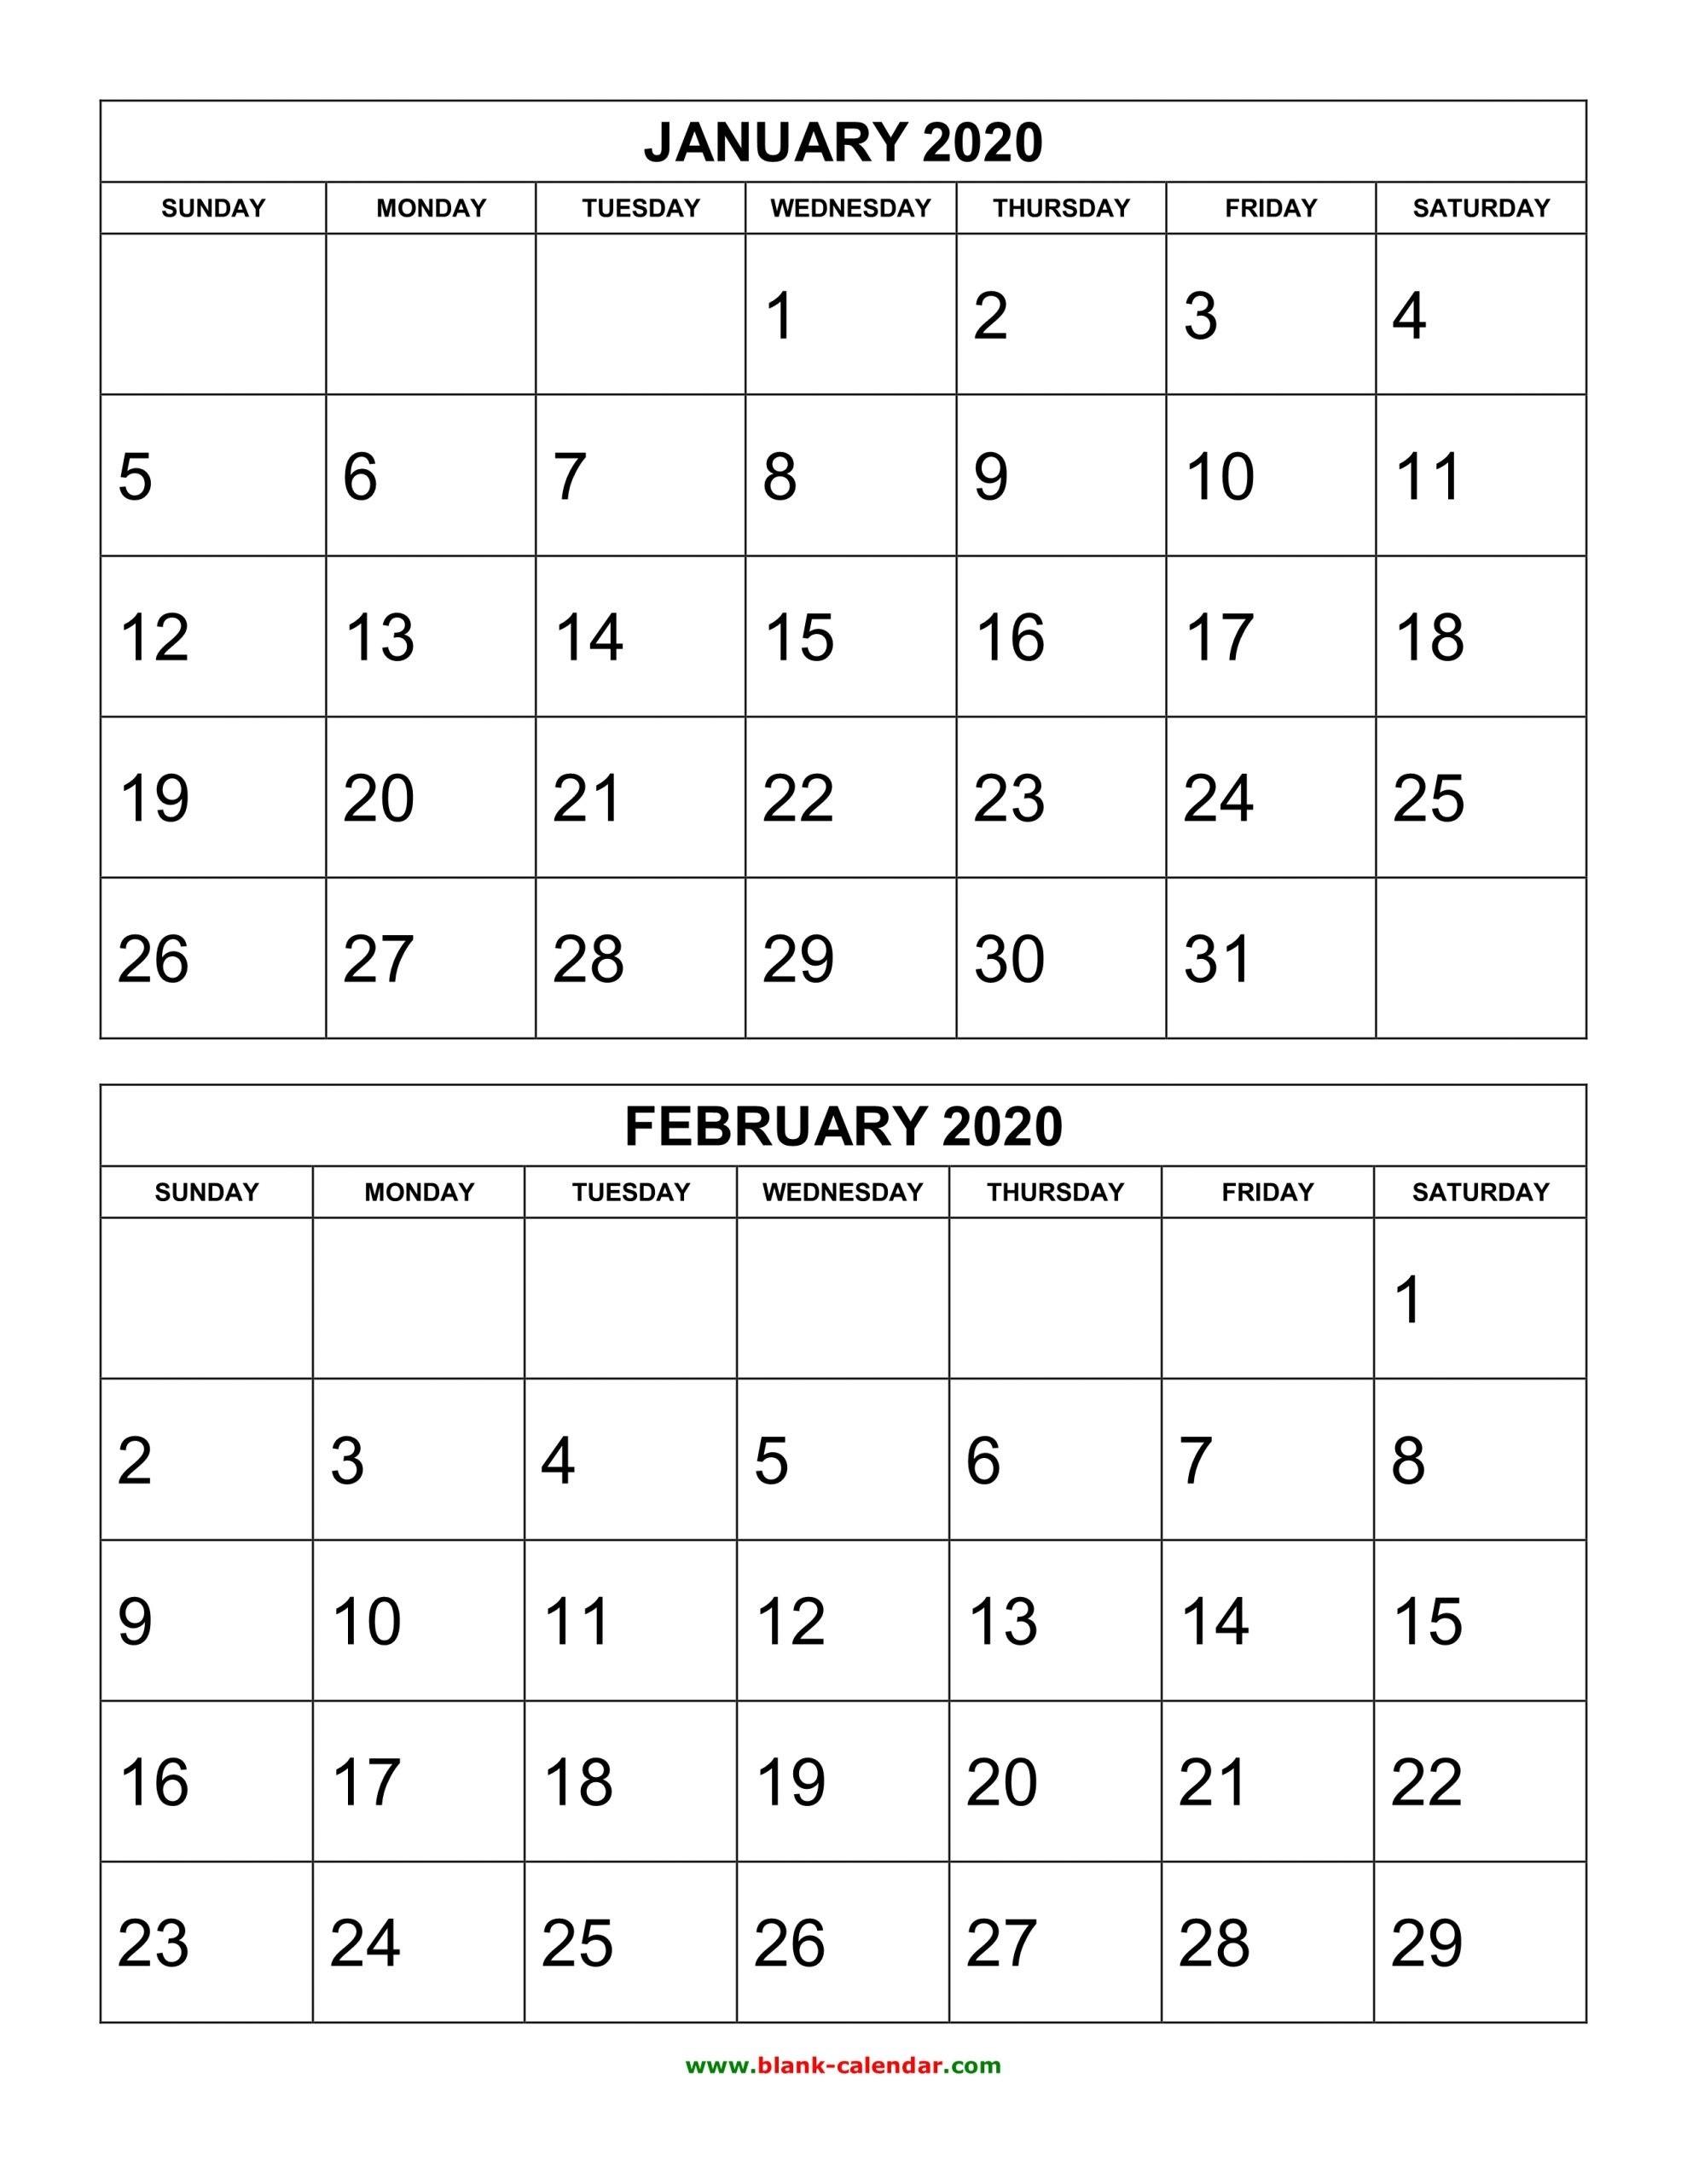 Get Half Page Calender 2020 | Calendar Printables Free Blank-Monthly Fill In Calendar 2021